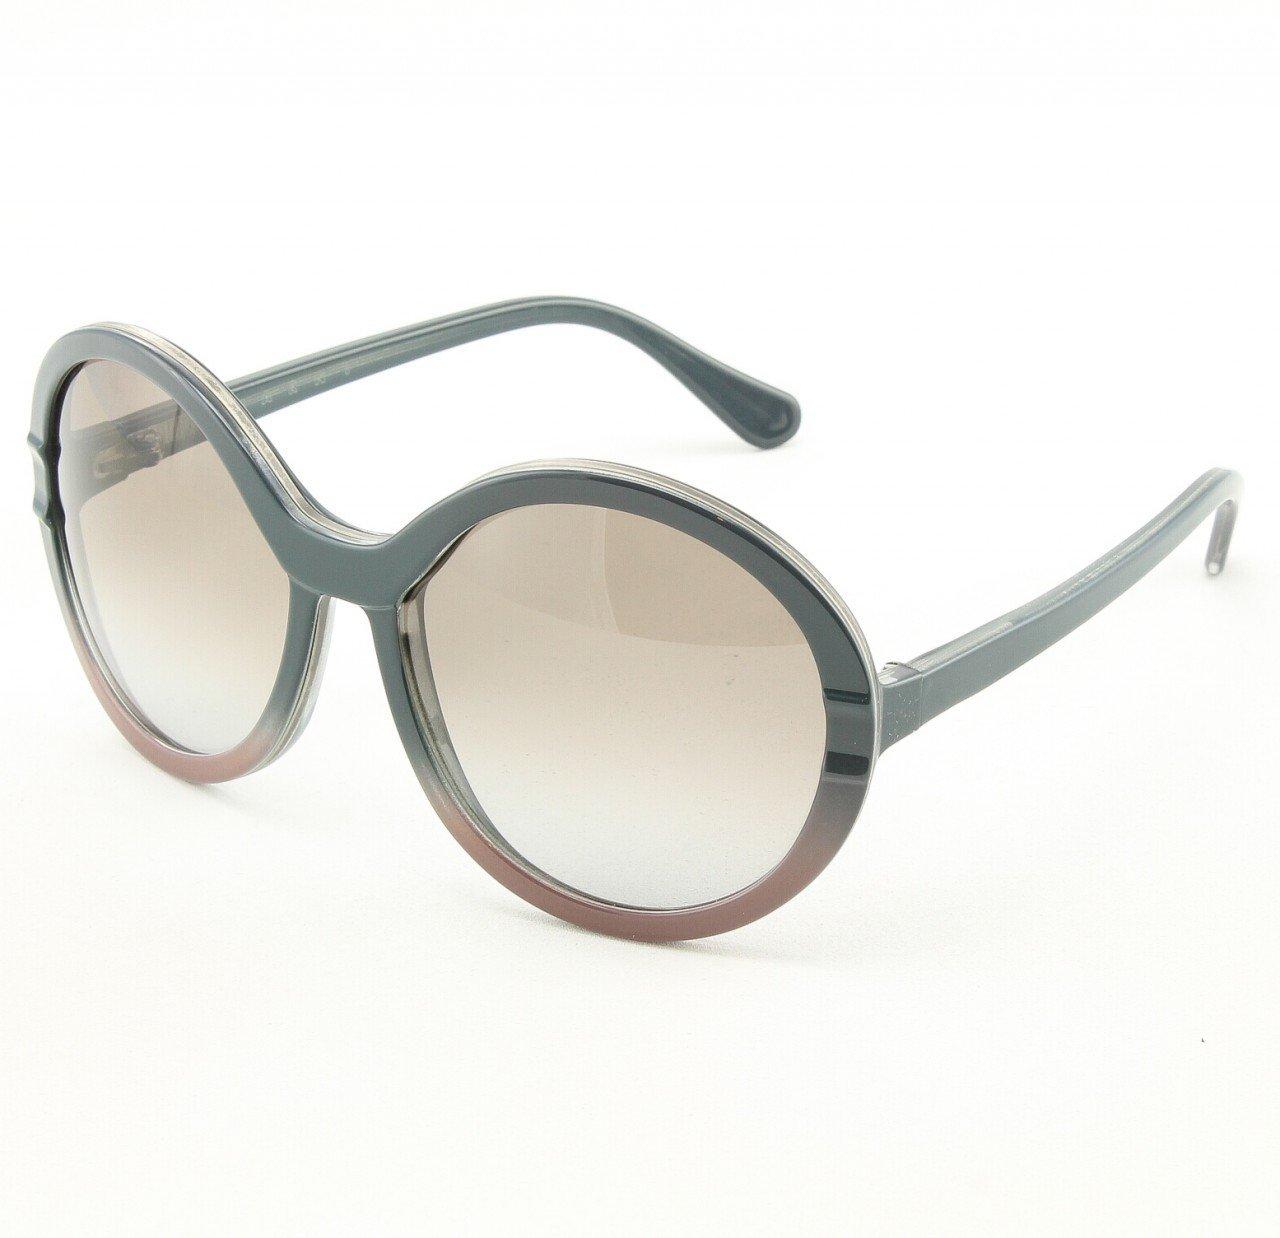 Marni MA145 Sunglasses Col. 04 Classic Gray Dusty Rose w/Decorative Accent with Gray Gradient Lenses